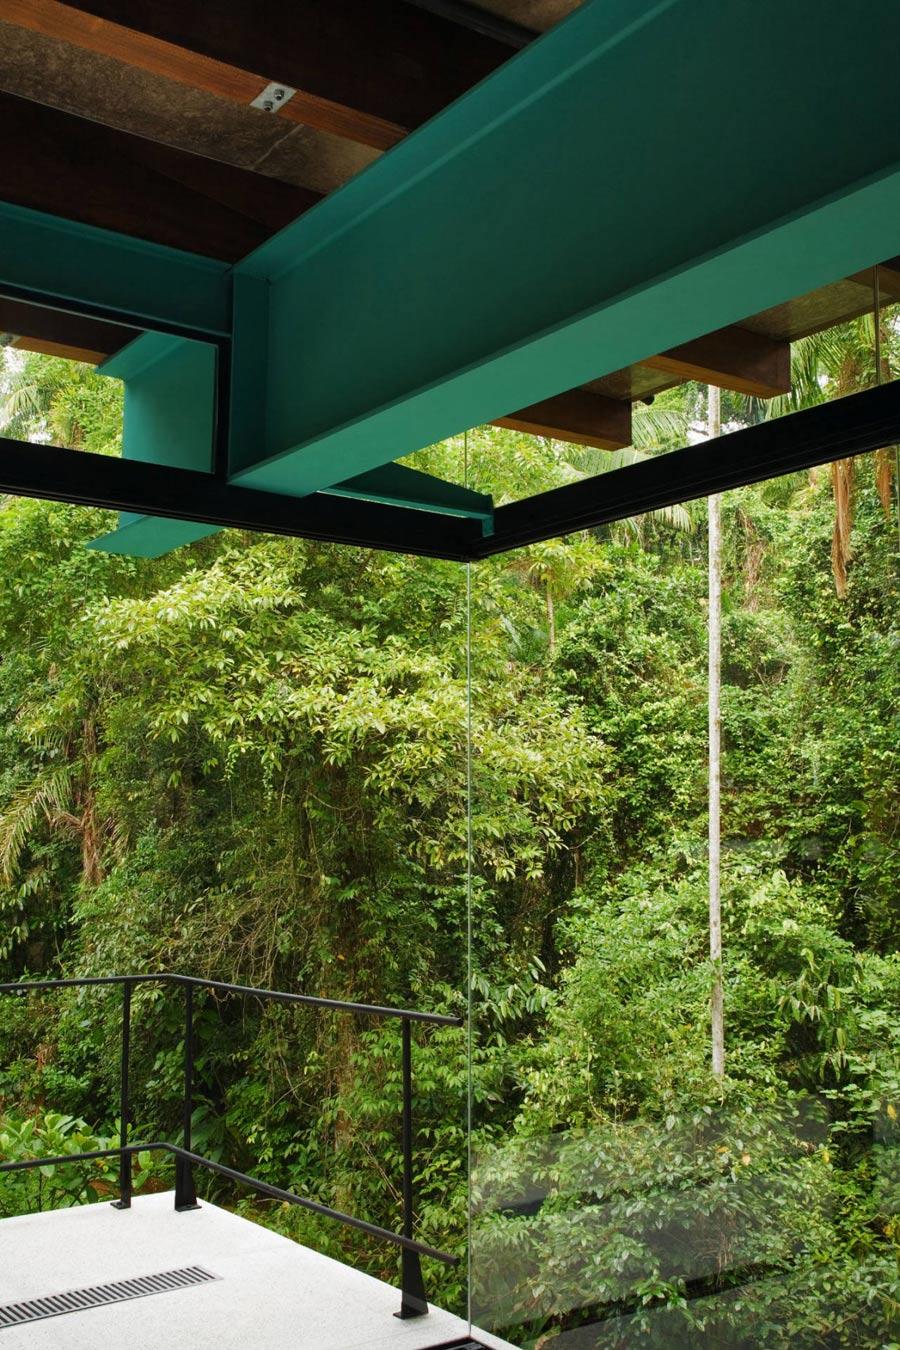 House in Iporanga,Brazil by Nitsche Arquitetos Associados